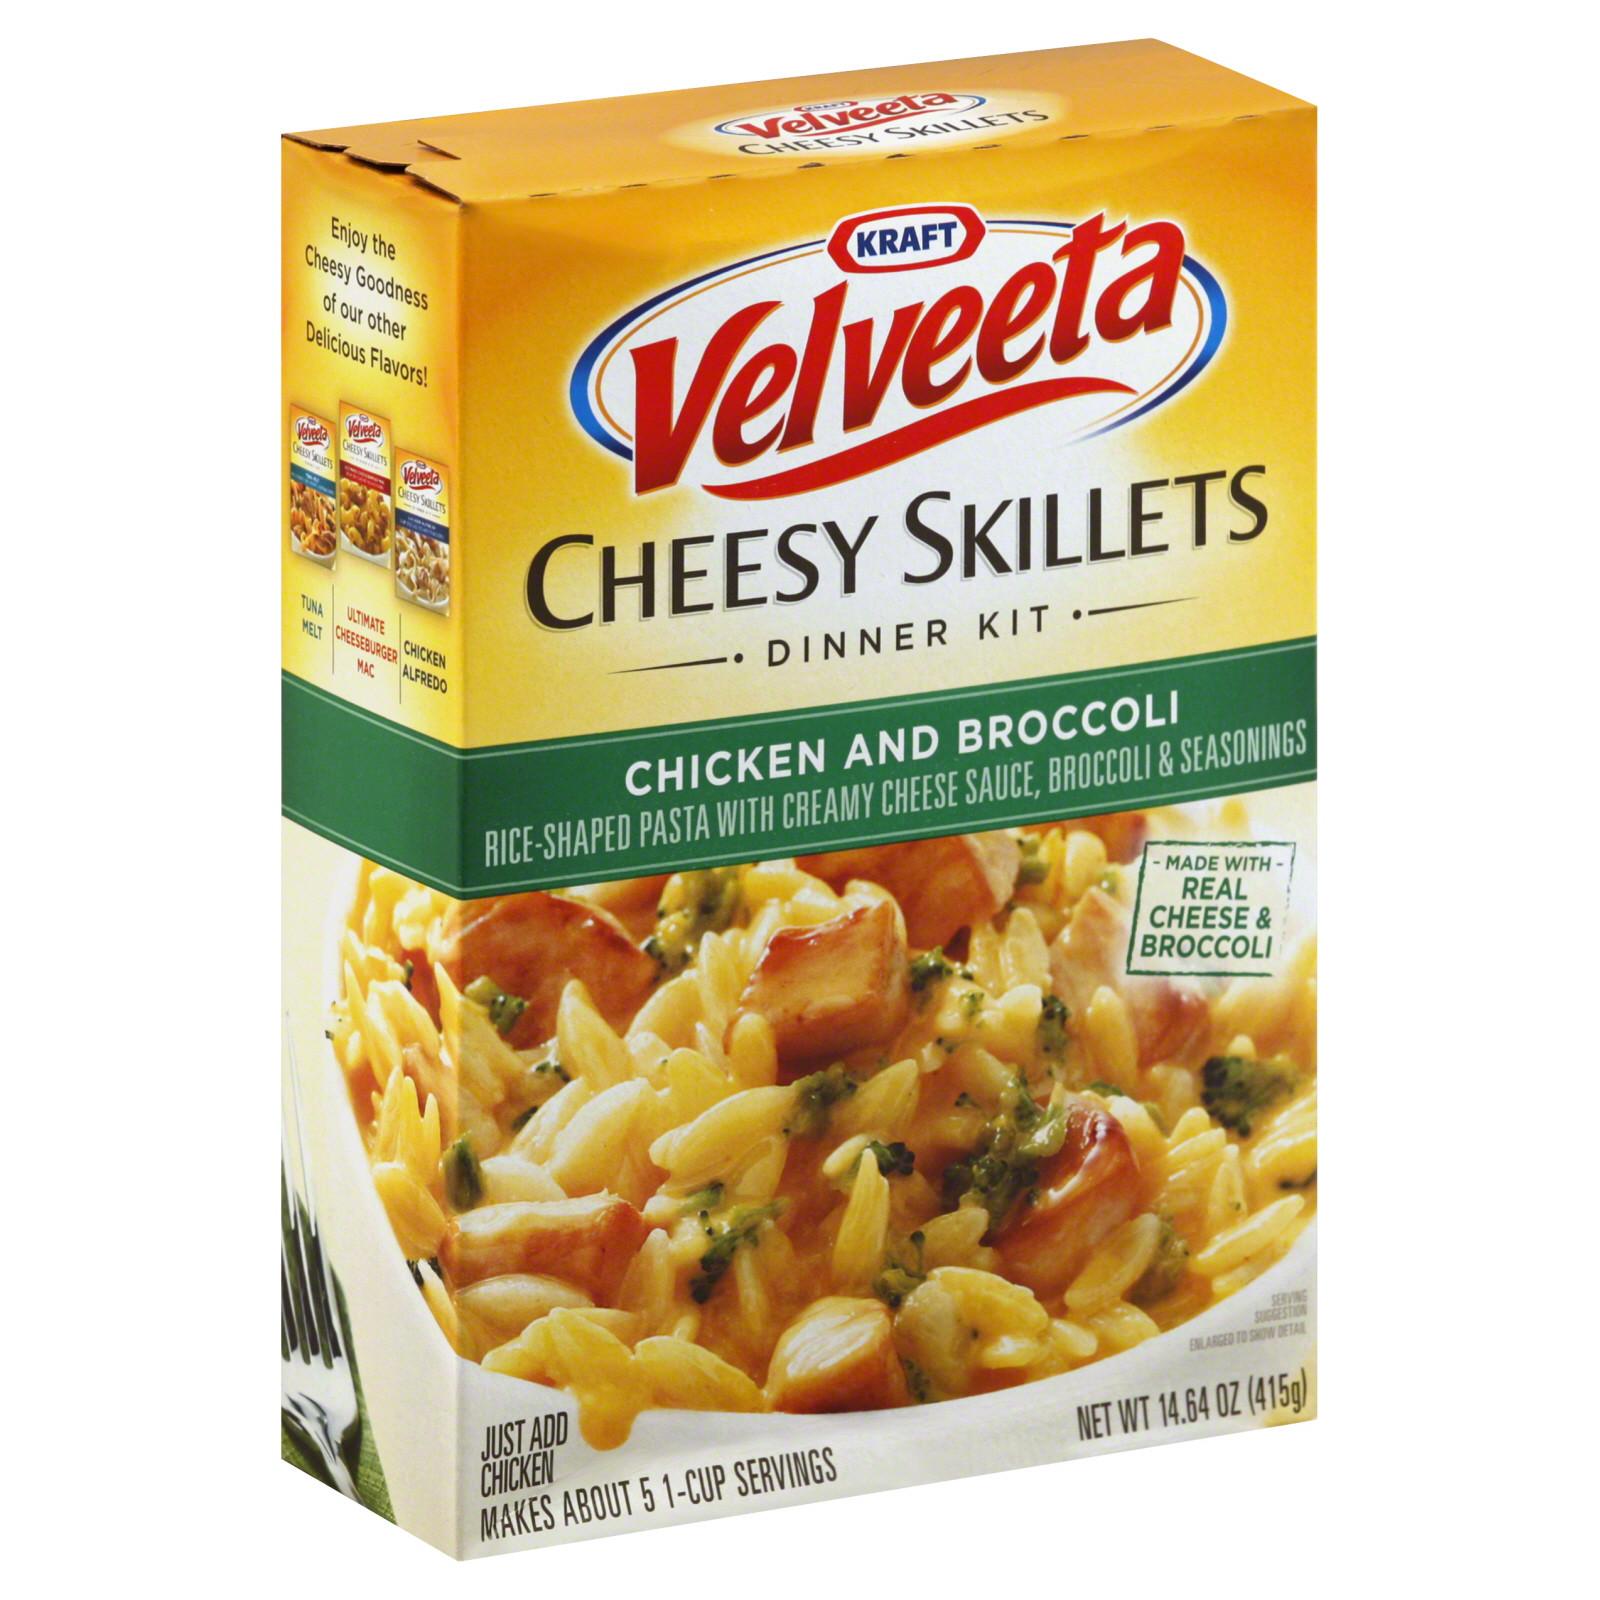 Broccoli And Velveeta Cheese  Velveeta Cheesy Skillets Dinner Kit Chicken and Broccoli